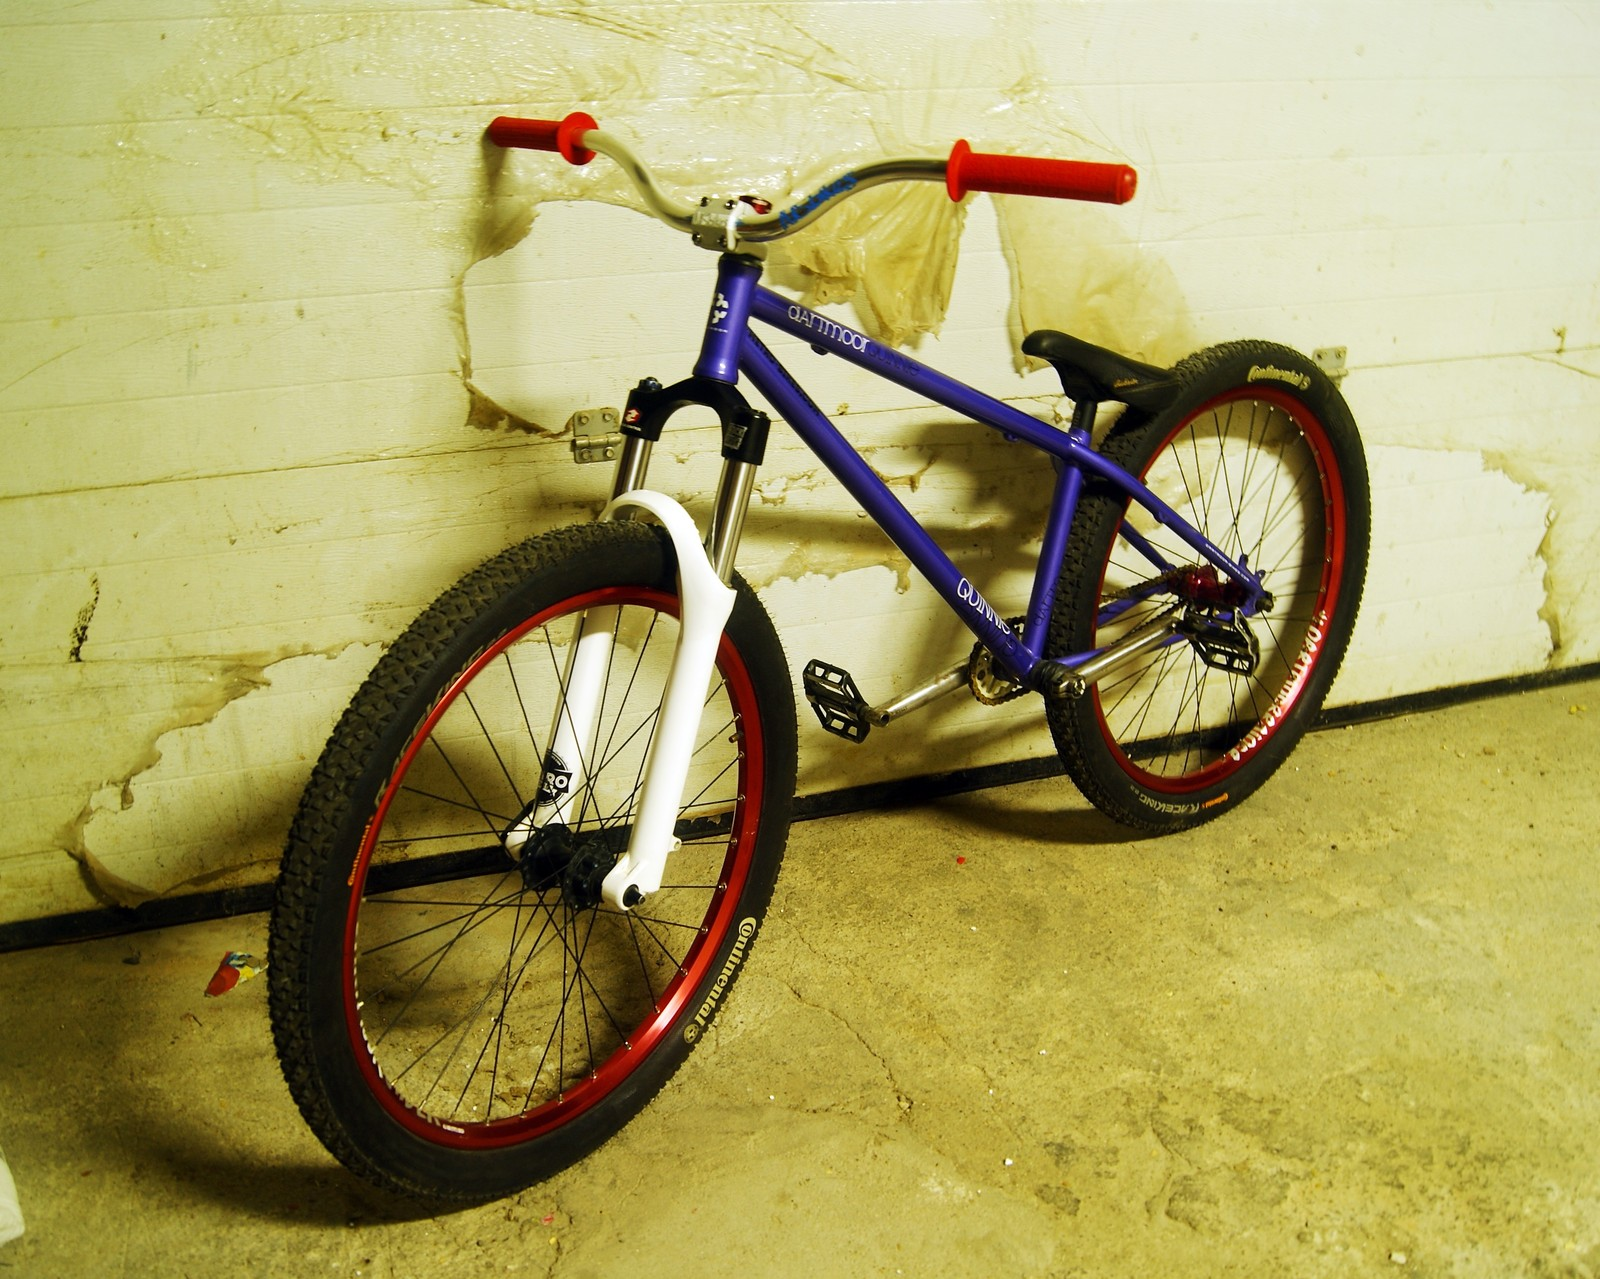 Mybieks - RubenBicho - Mountain Biking Pictures - Vital MTB